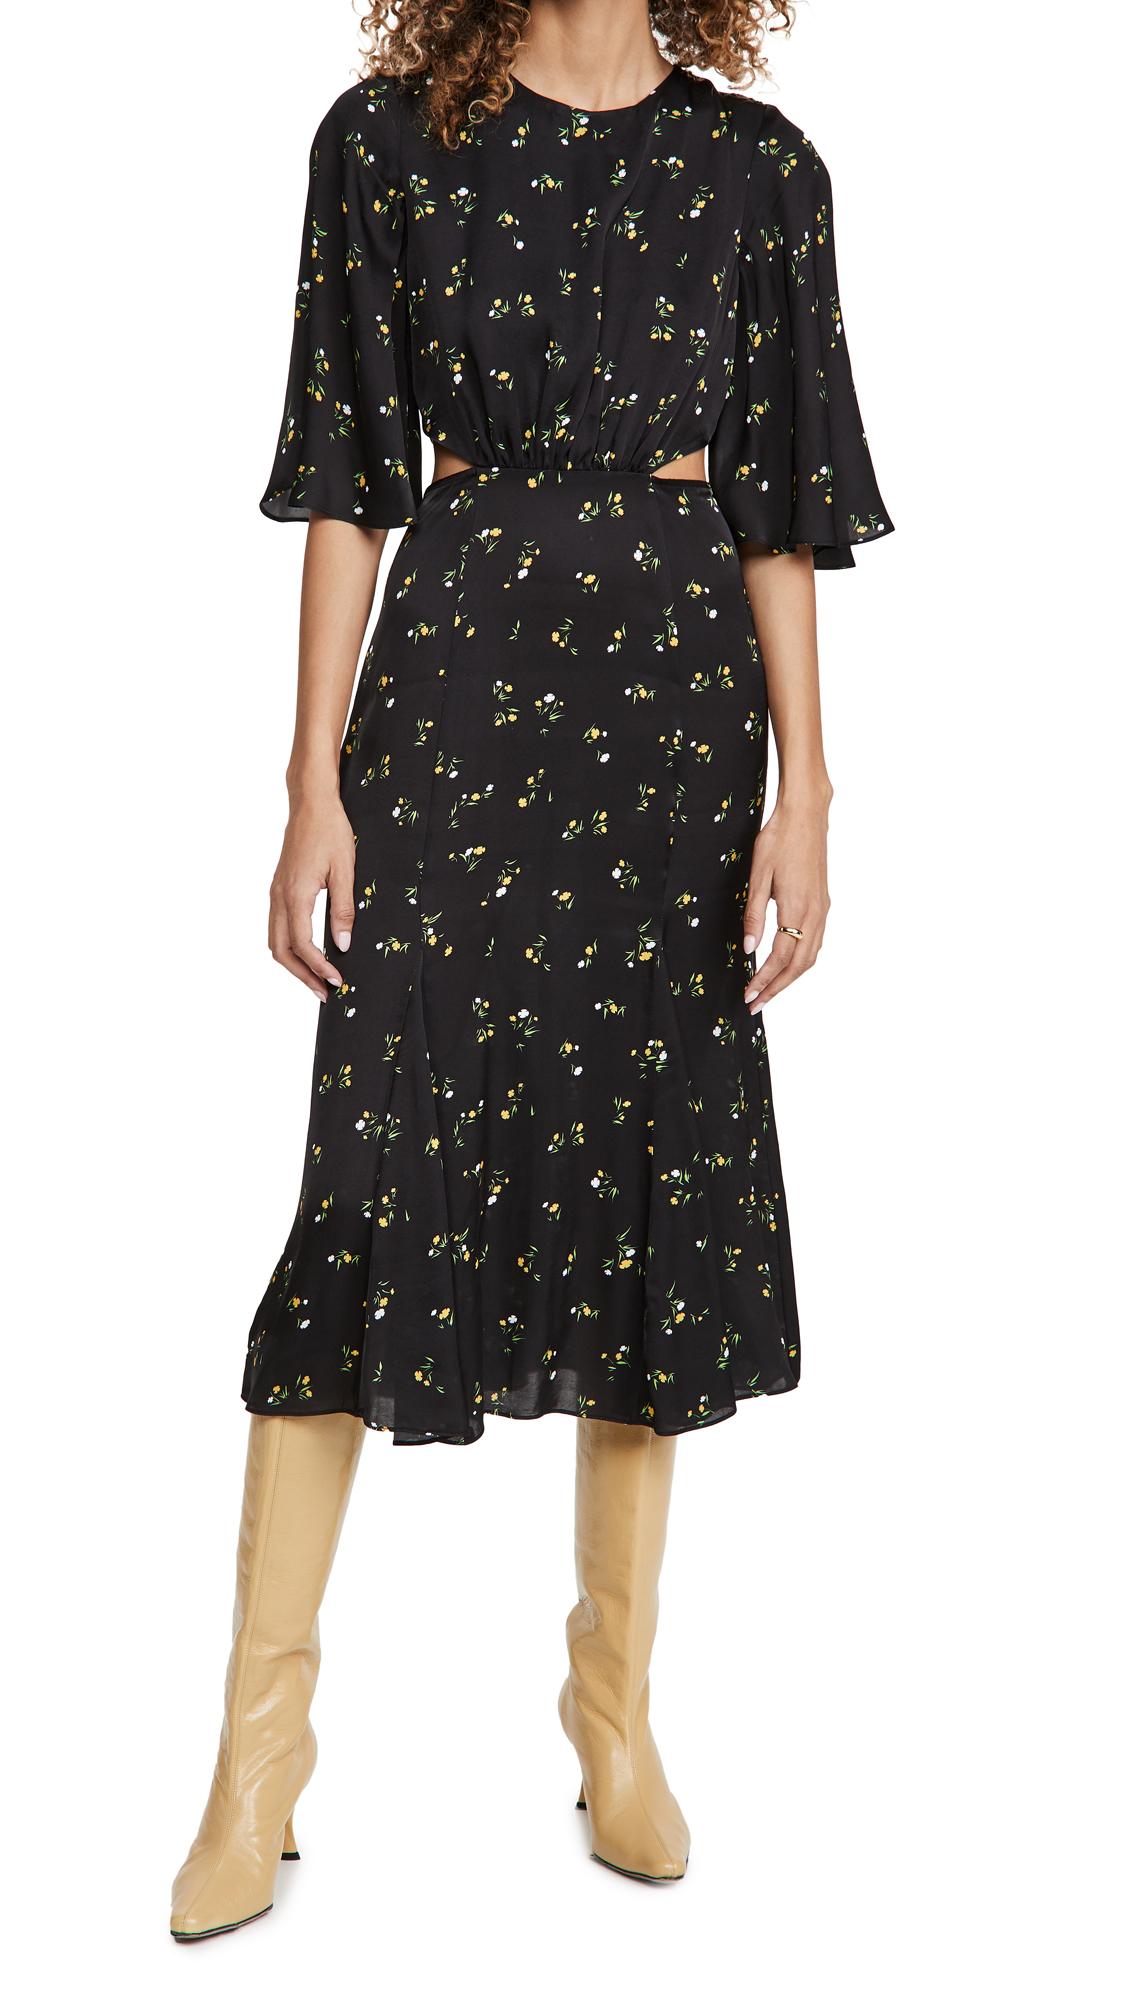 LES REVERIES Petal Sleeve Cutout Tea Dress